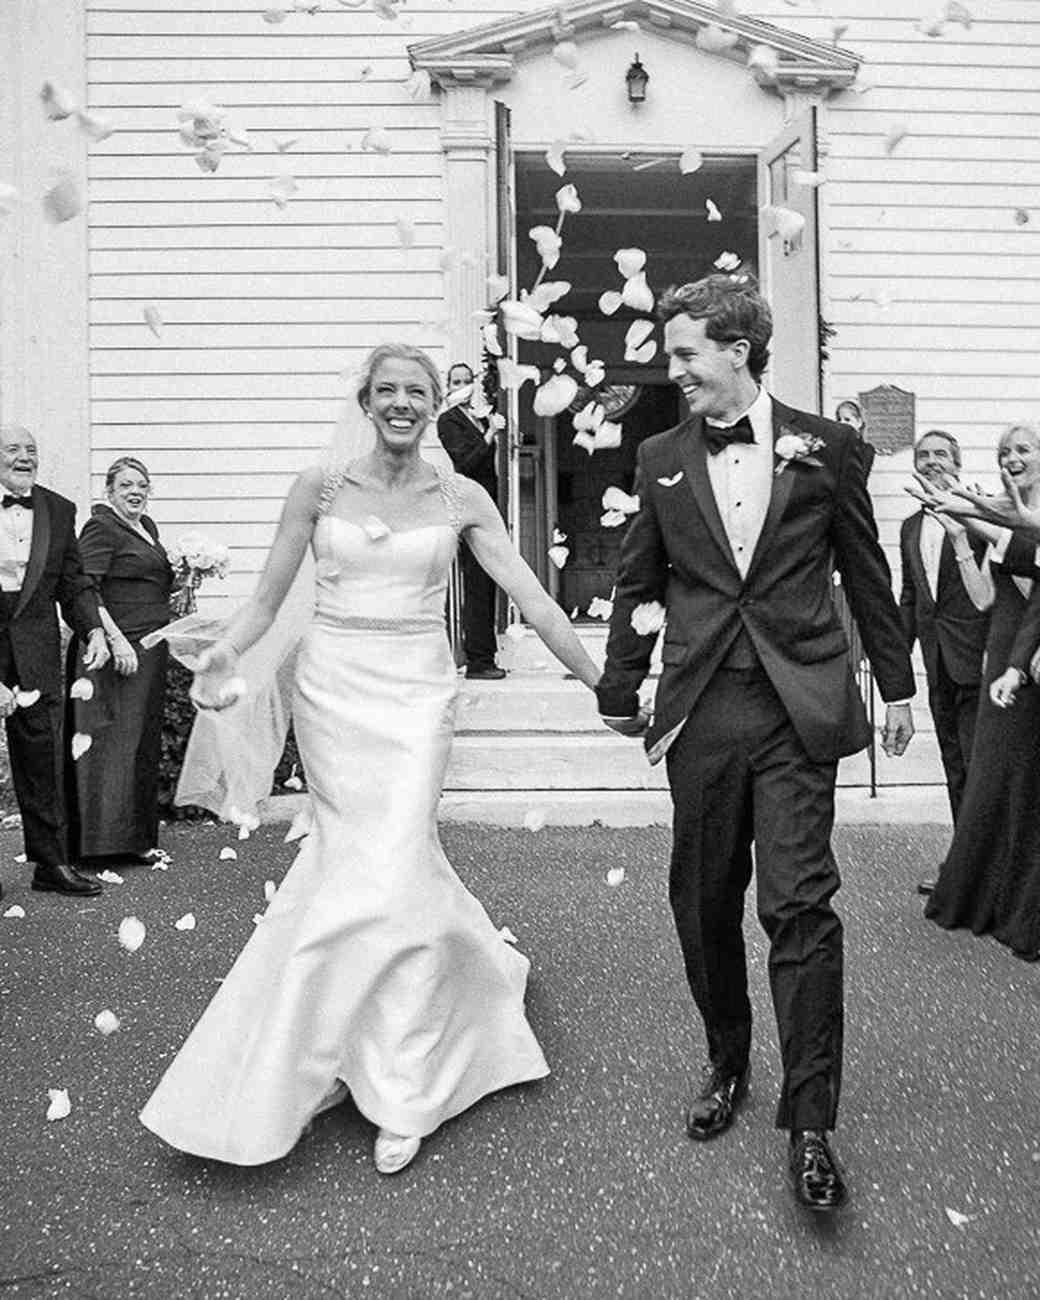 modern wedding guests throwing petals